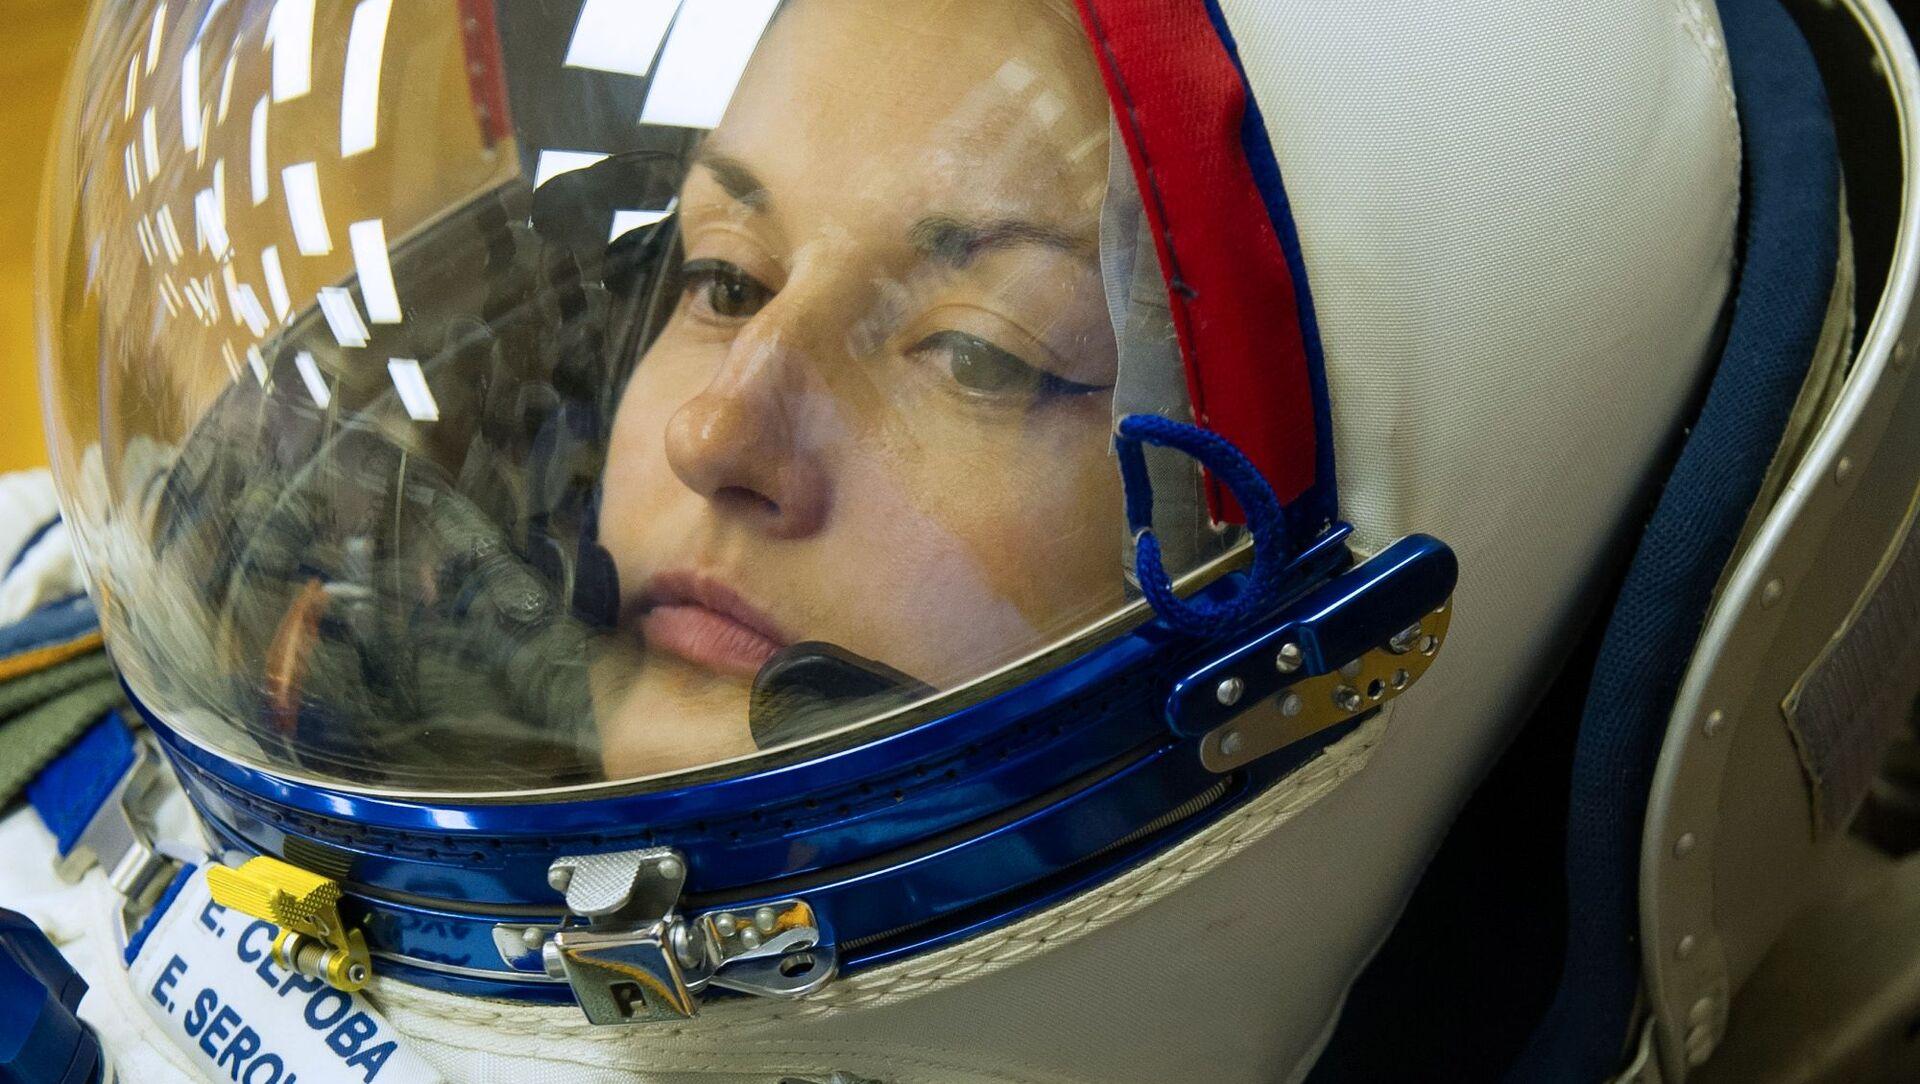 Valientes y fuertes: mujeres cosmonautas rusas - Sputnik Mundo, 1920, 22.01.2019